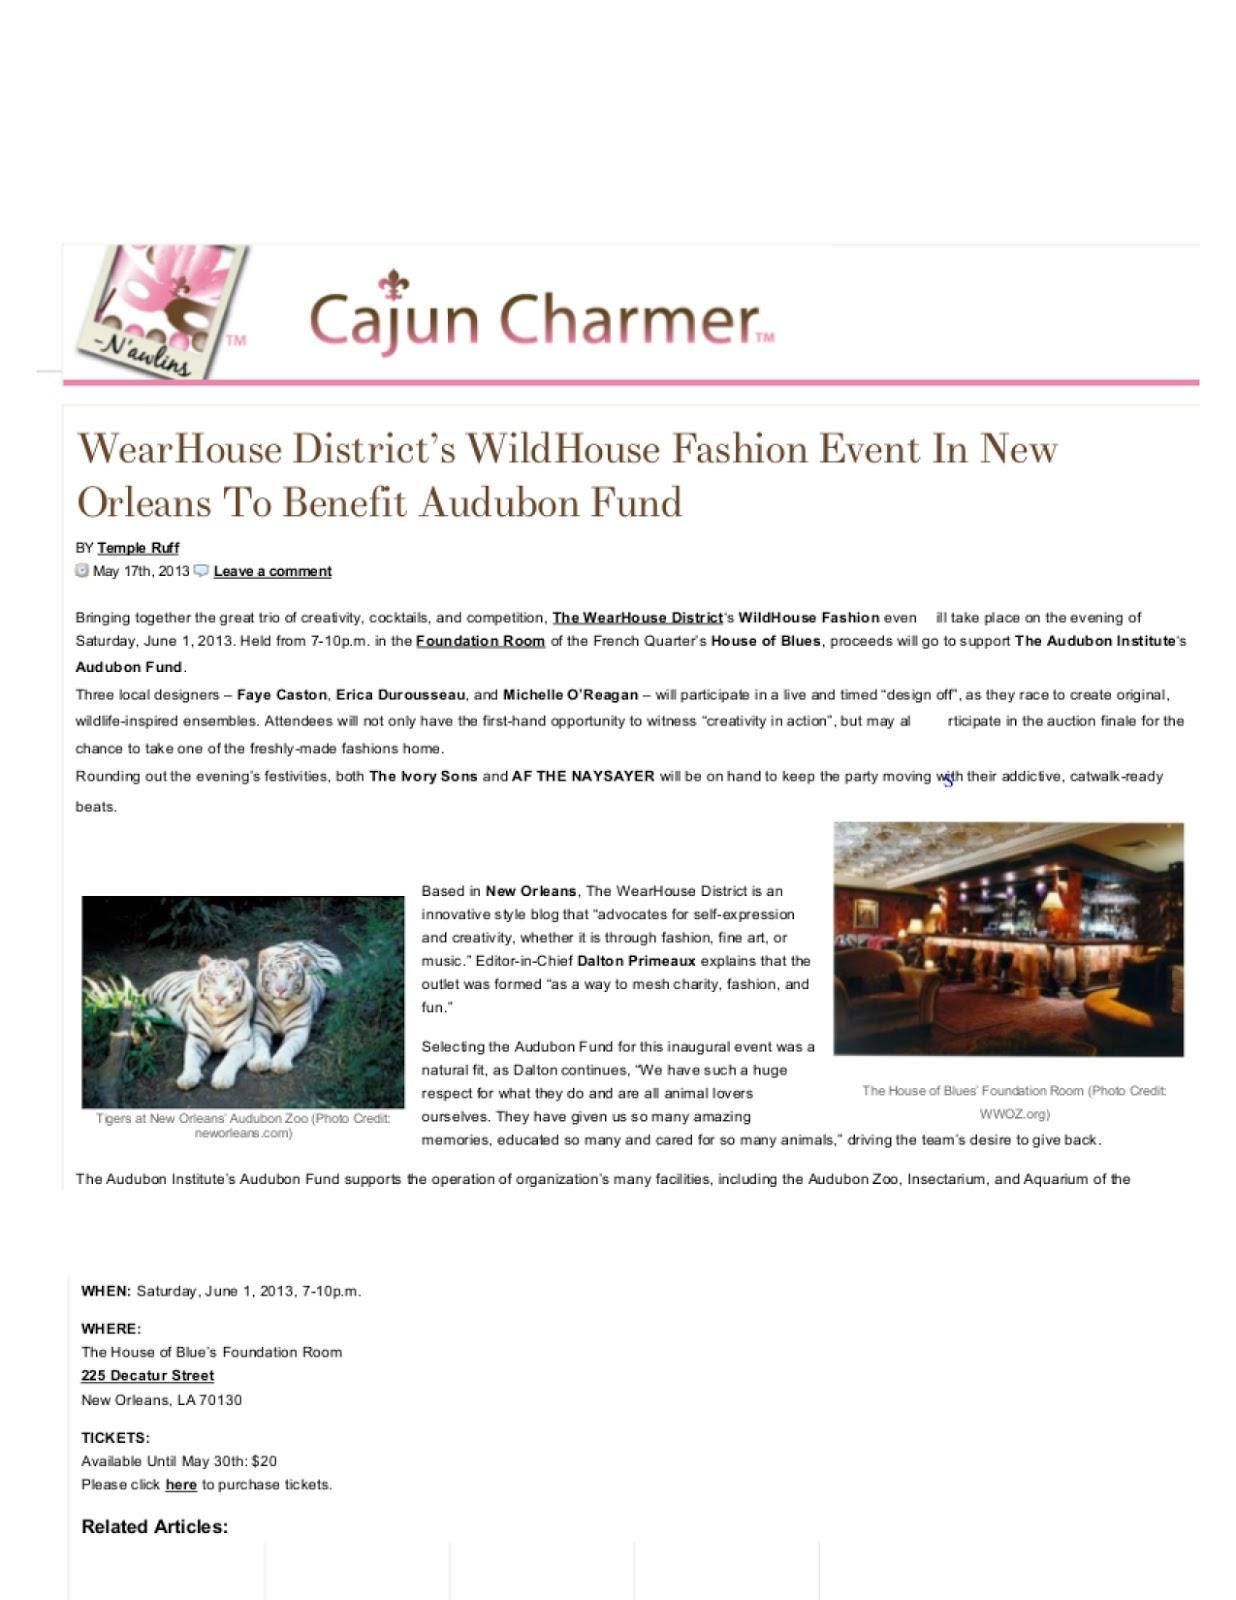 Cajun Charmer Press